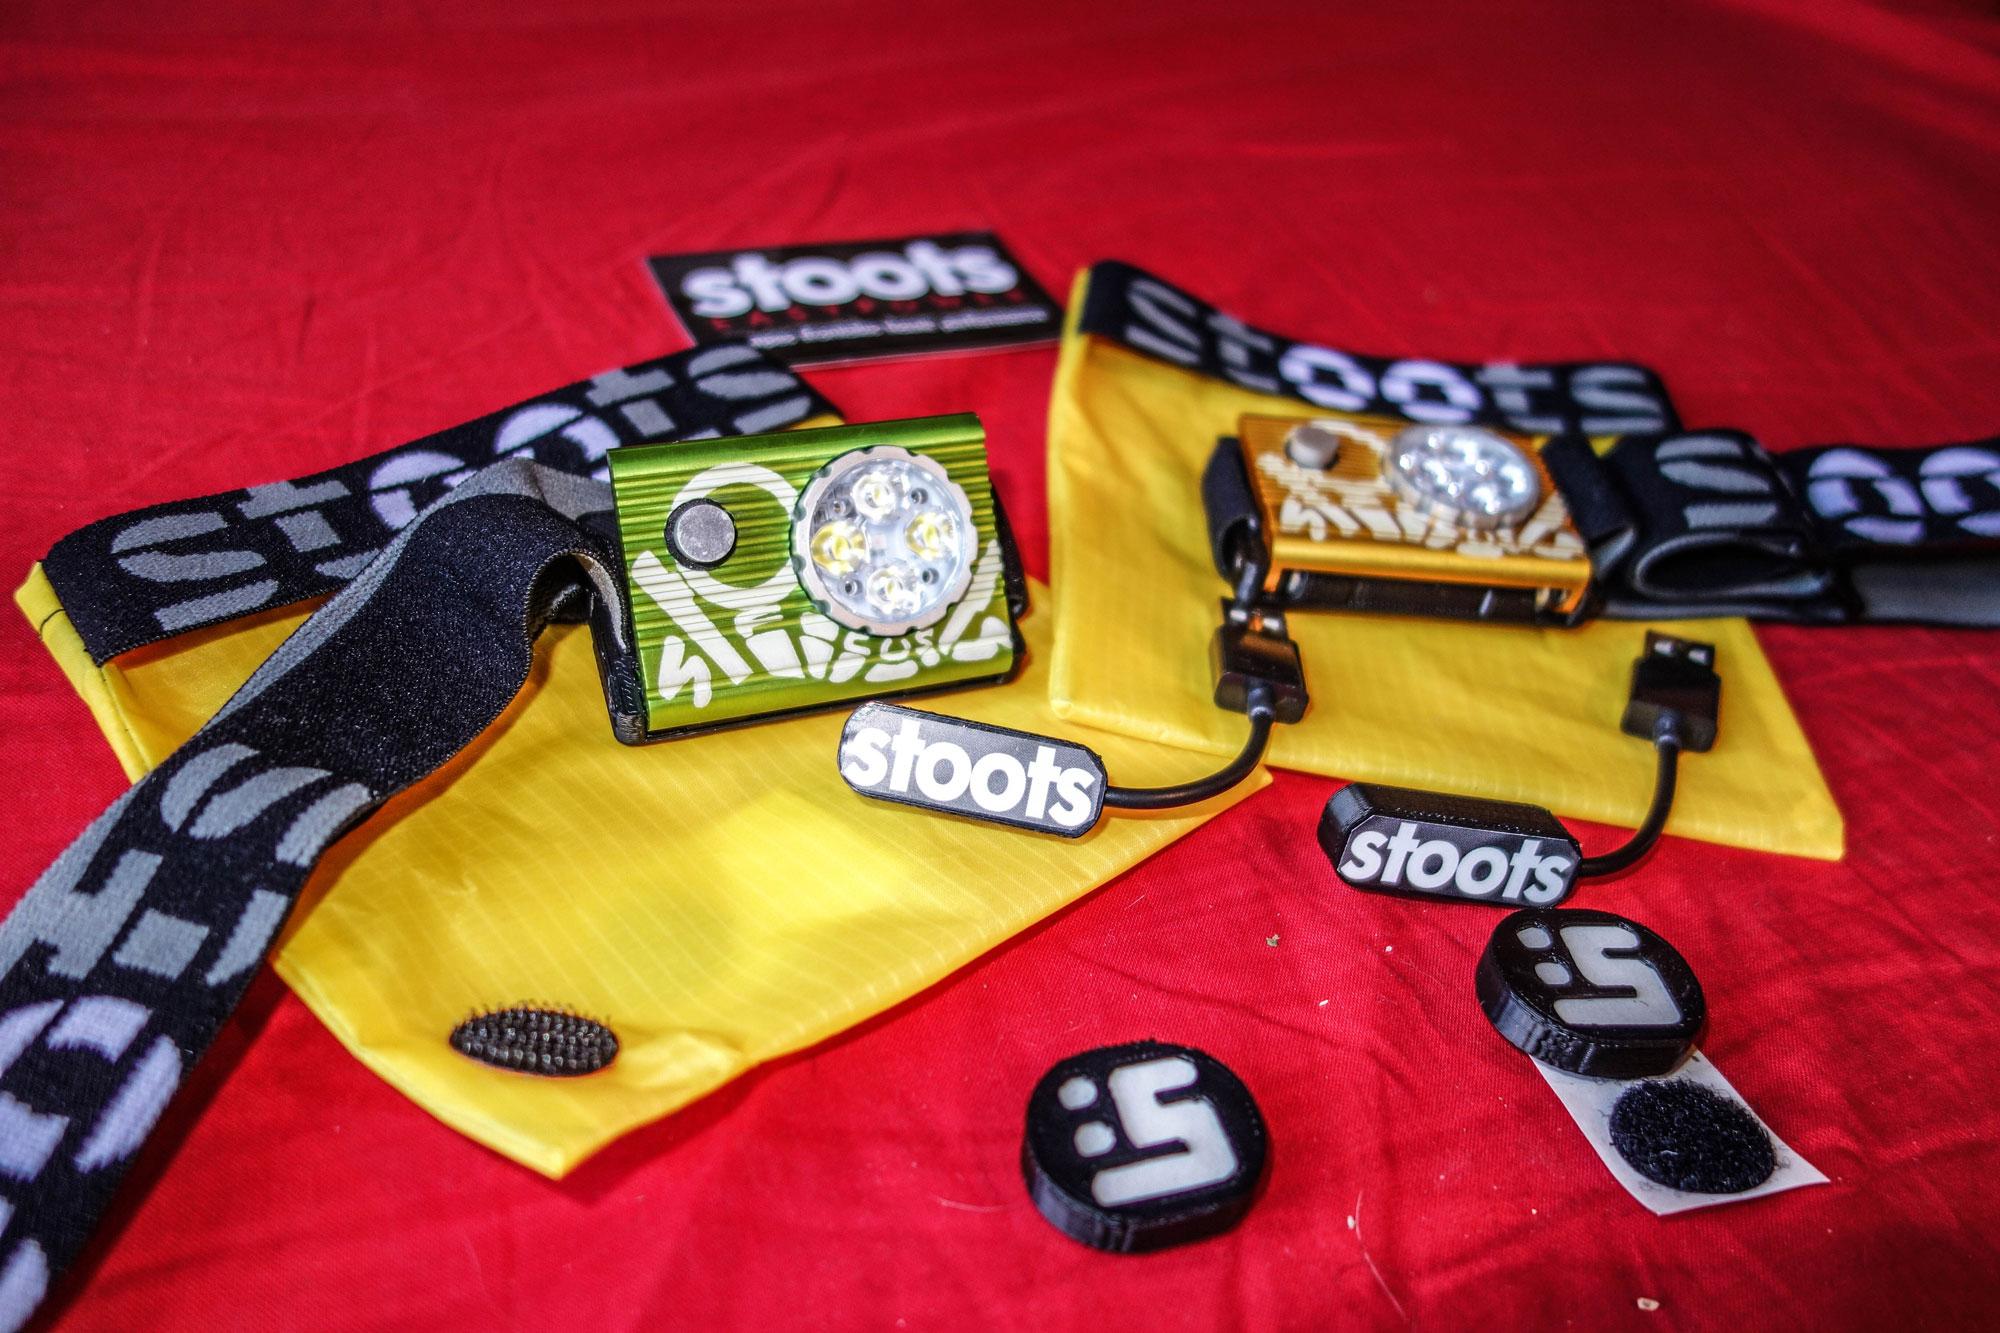 Stoots-concept-Francois-Ragolski